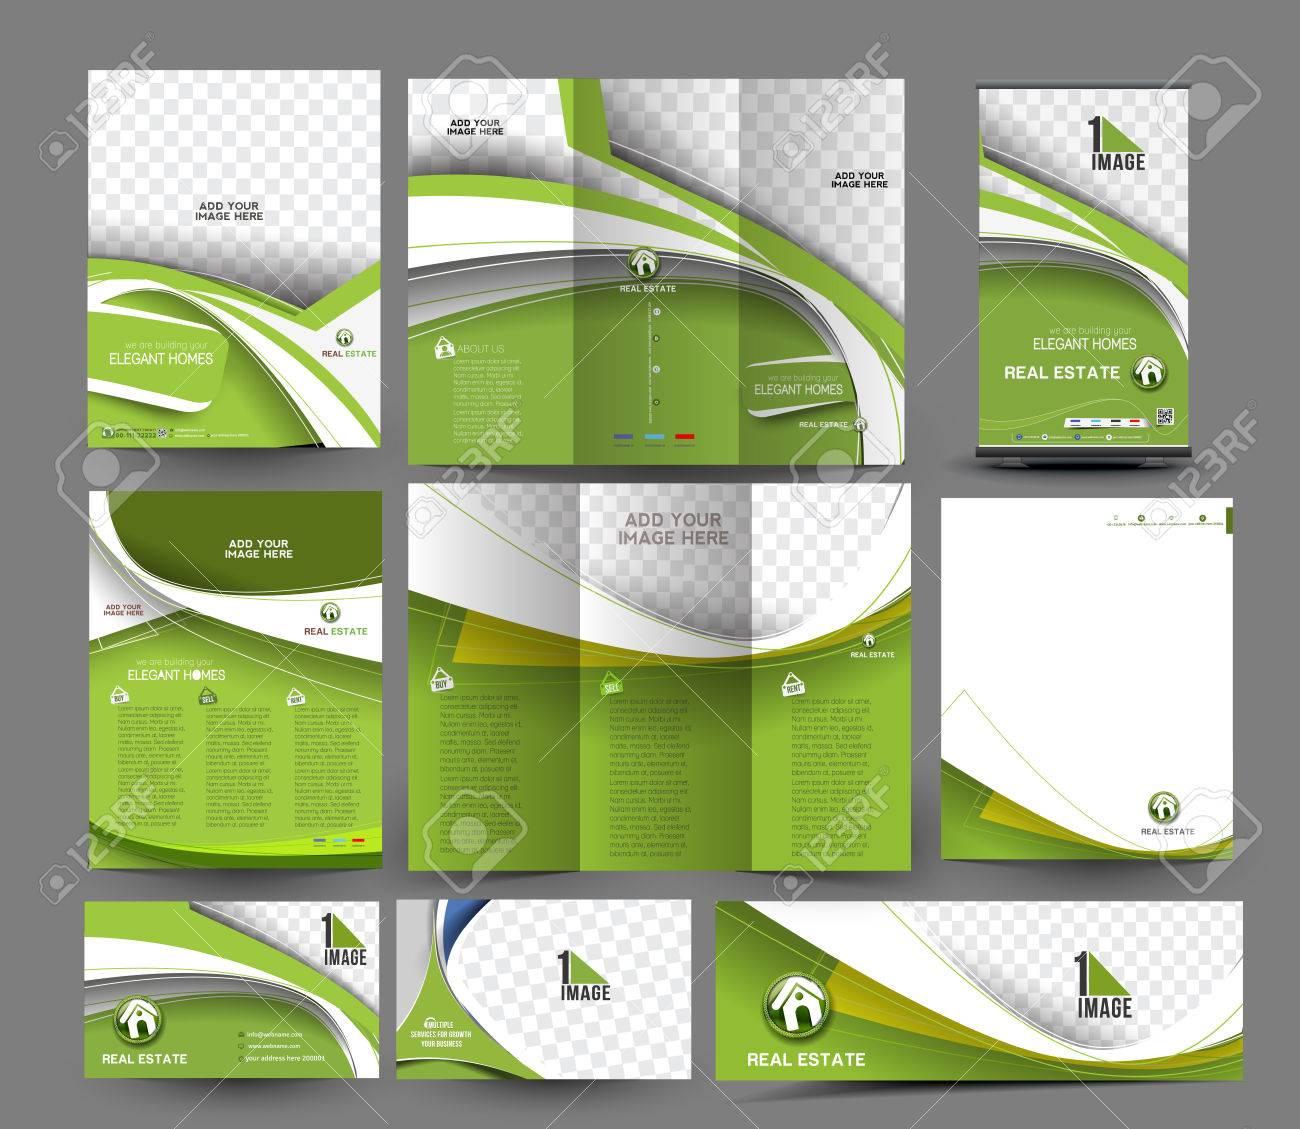 Interior Designer Business Stationery Set Template - 41834248